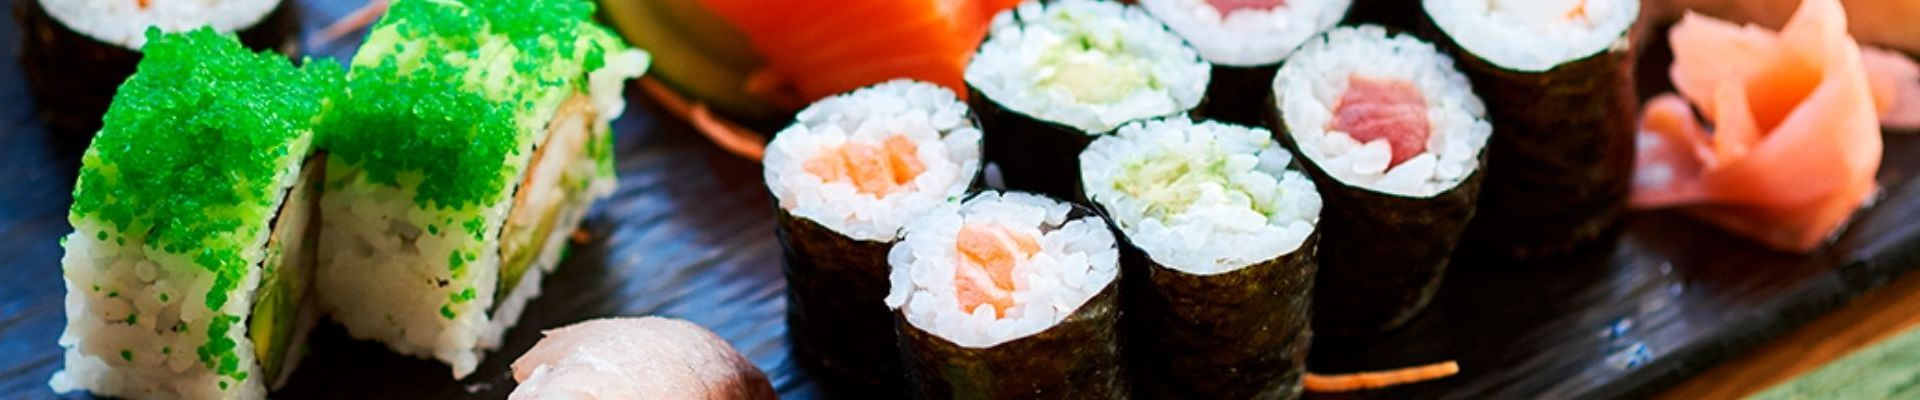 Mejores restaurantes de sushi en Palma